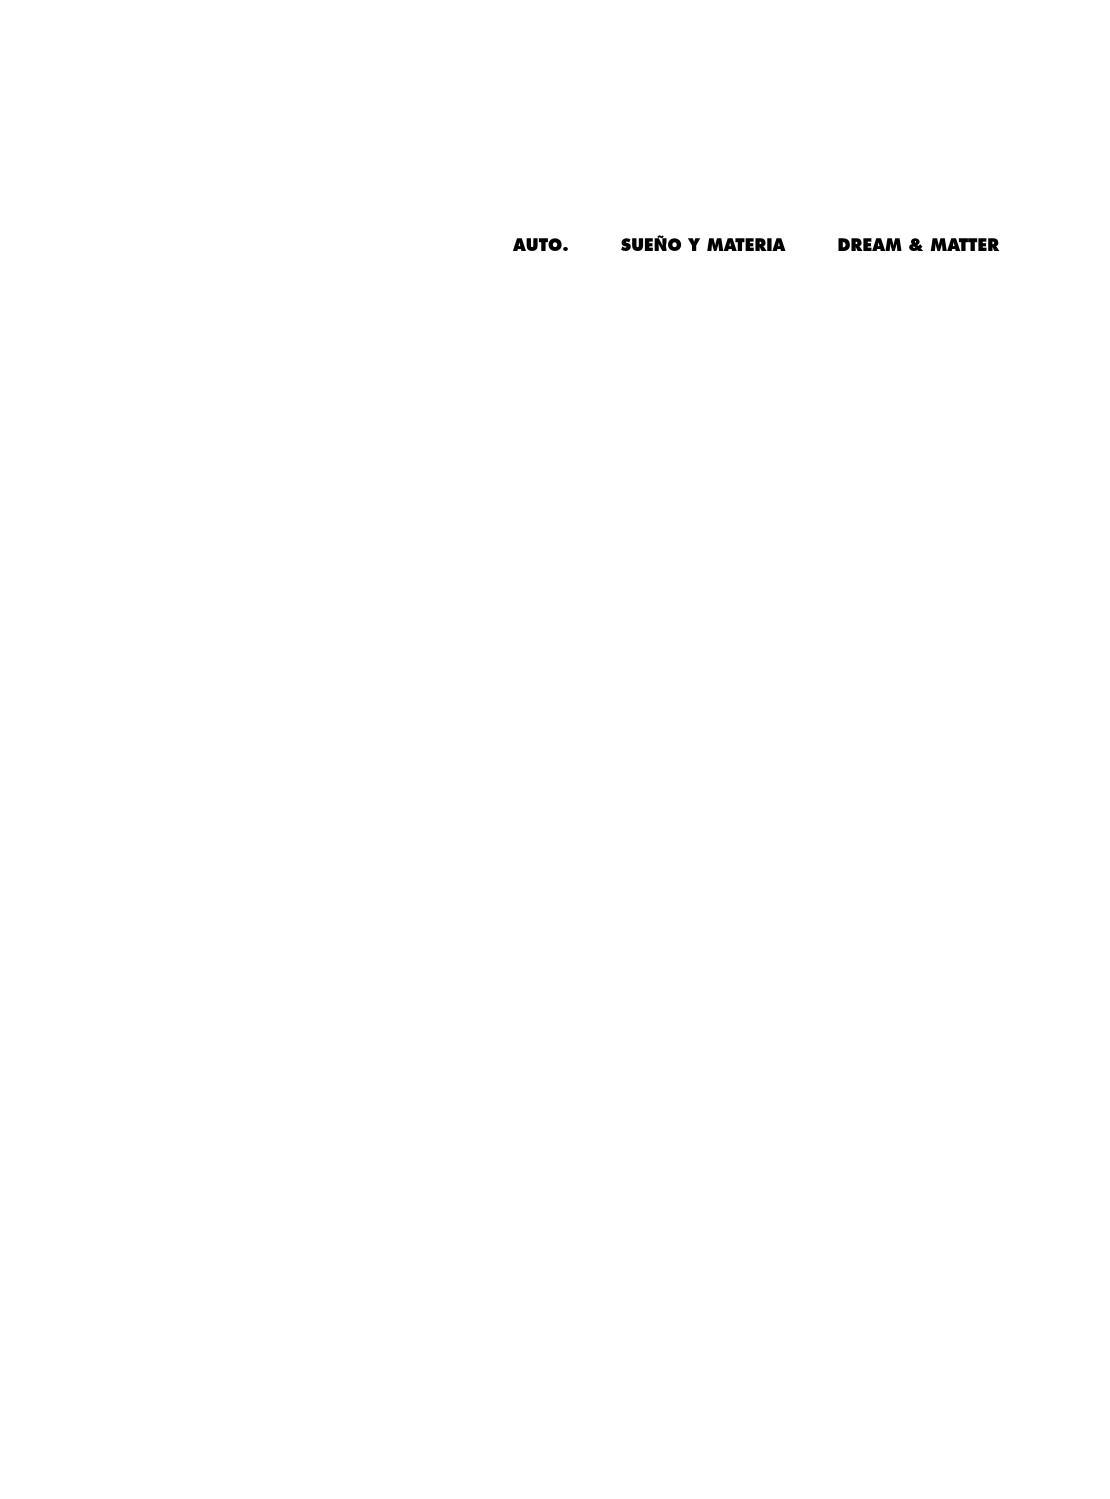 7 Pc Vidrio Auto Expansi/ón FCC Conjunto Parabrisas herramienta indispensable para Auto